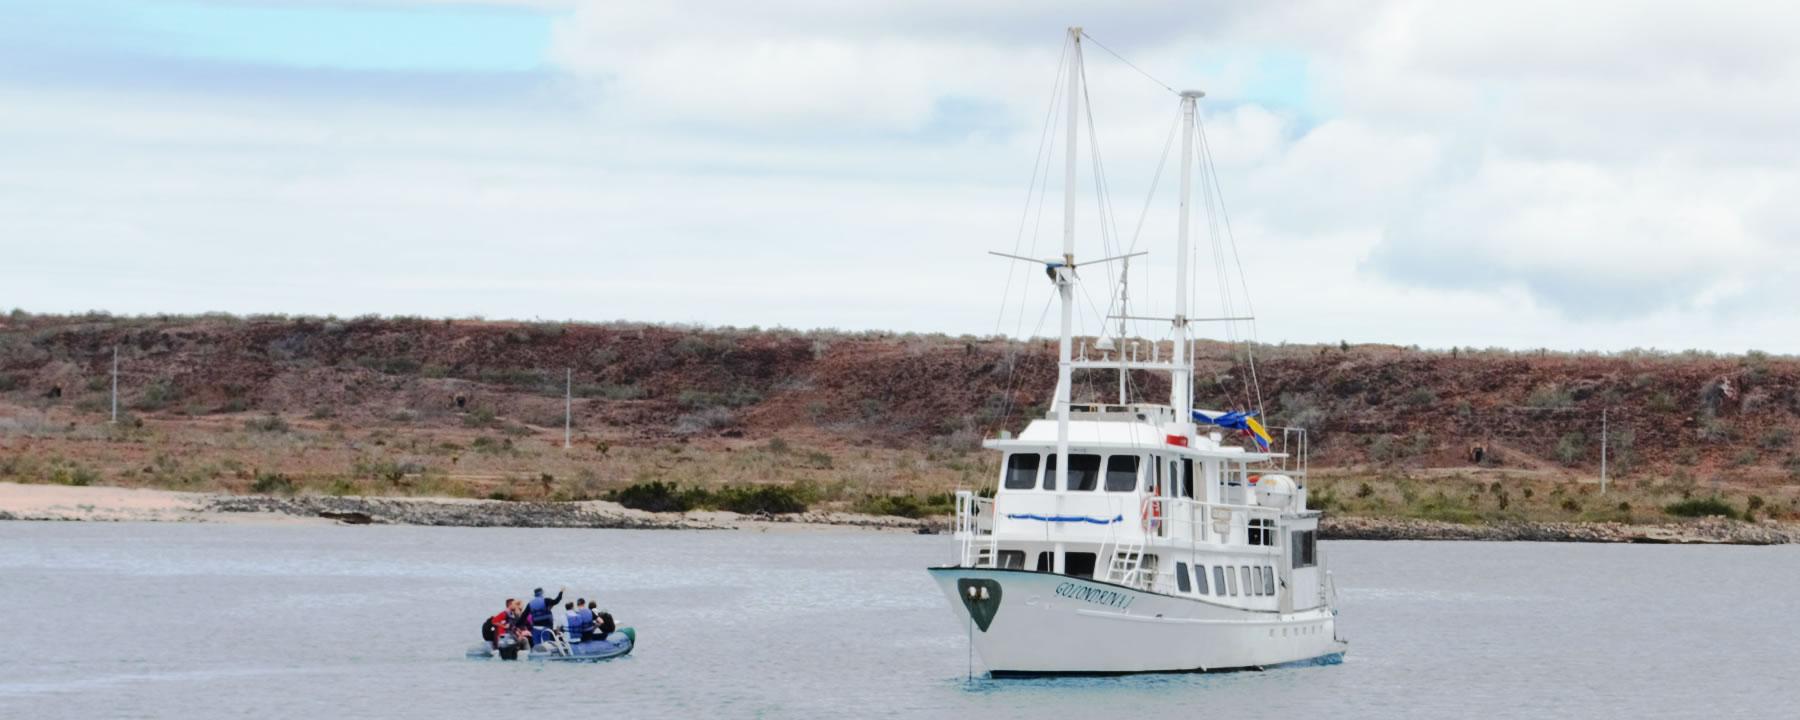 Embarking on Baltra Island